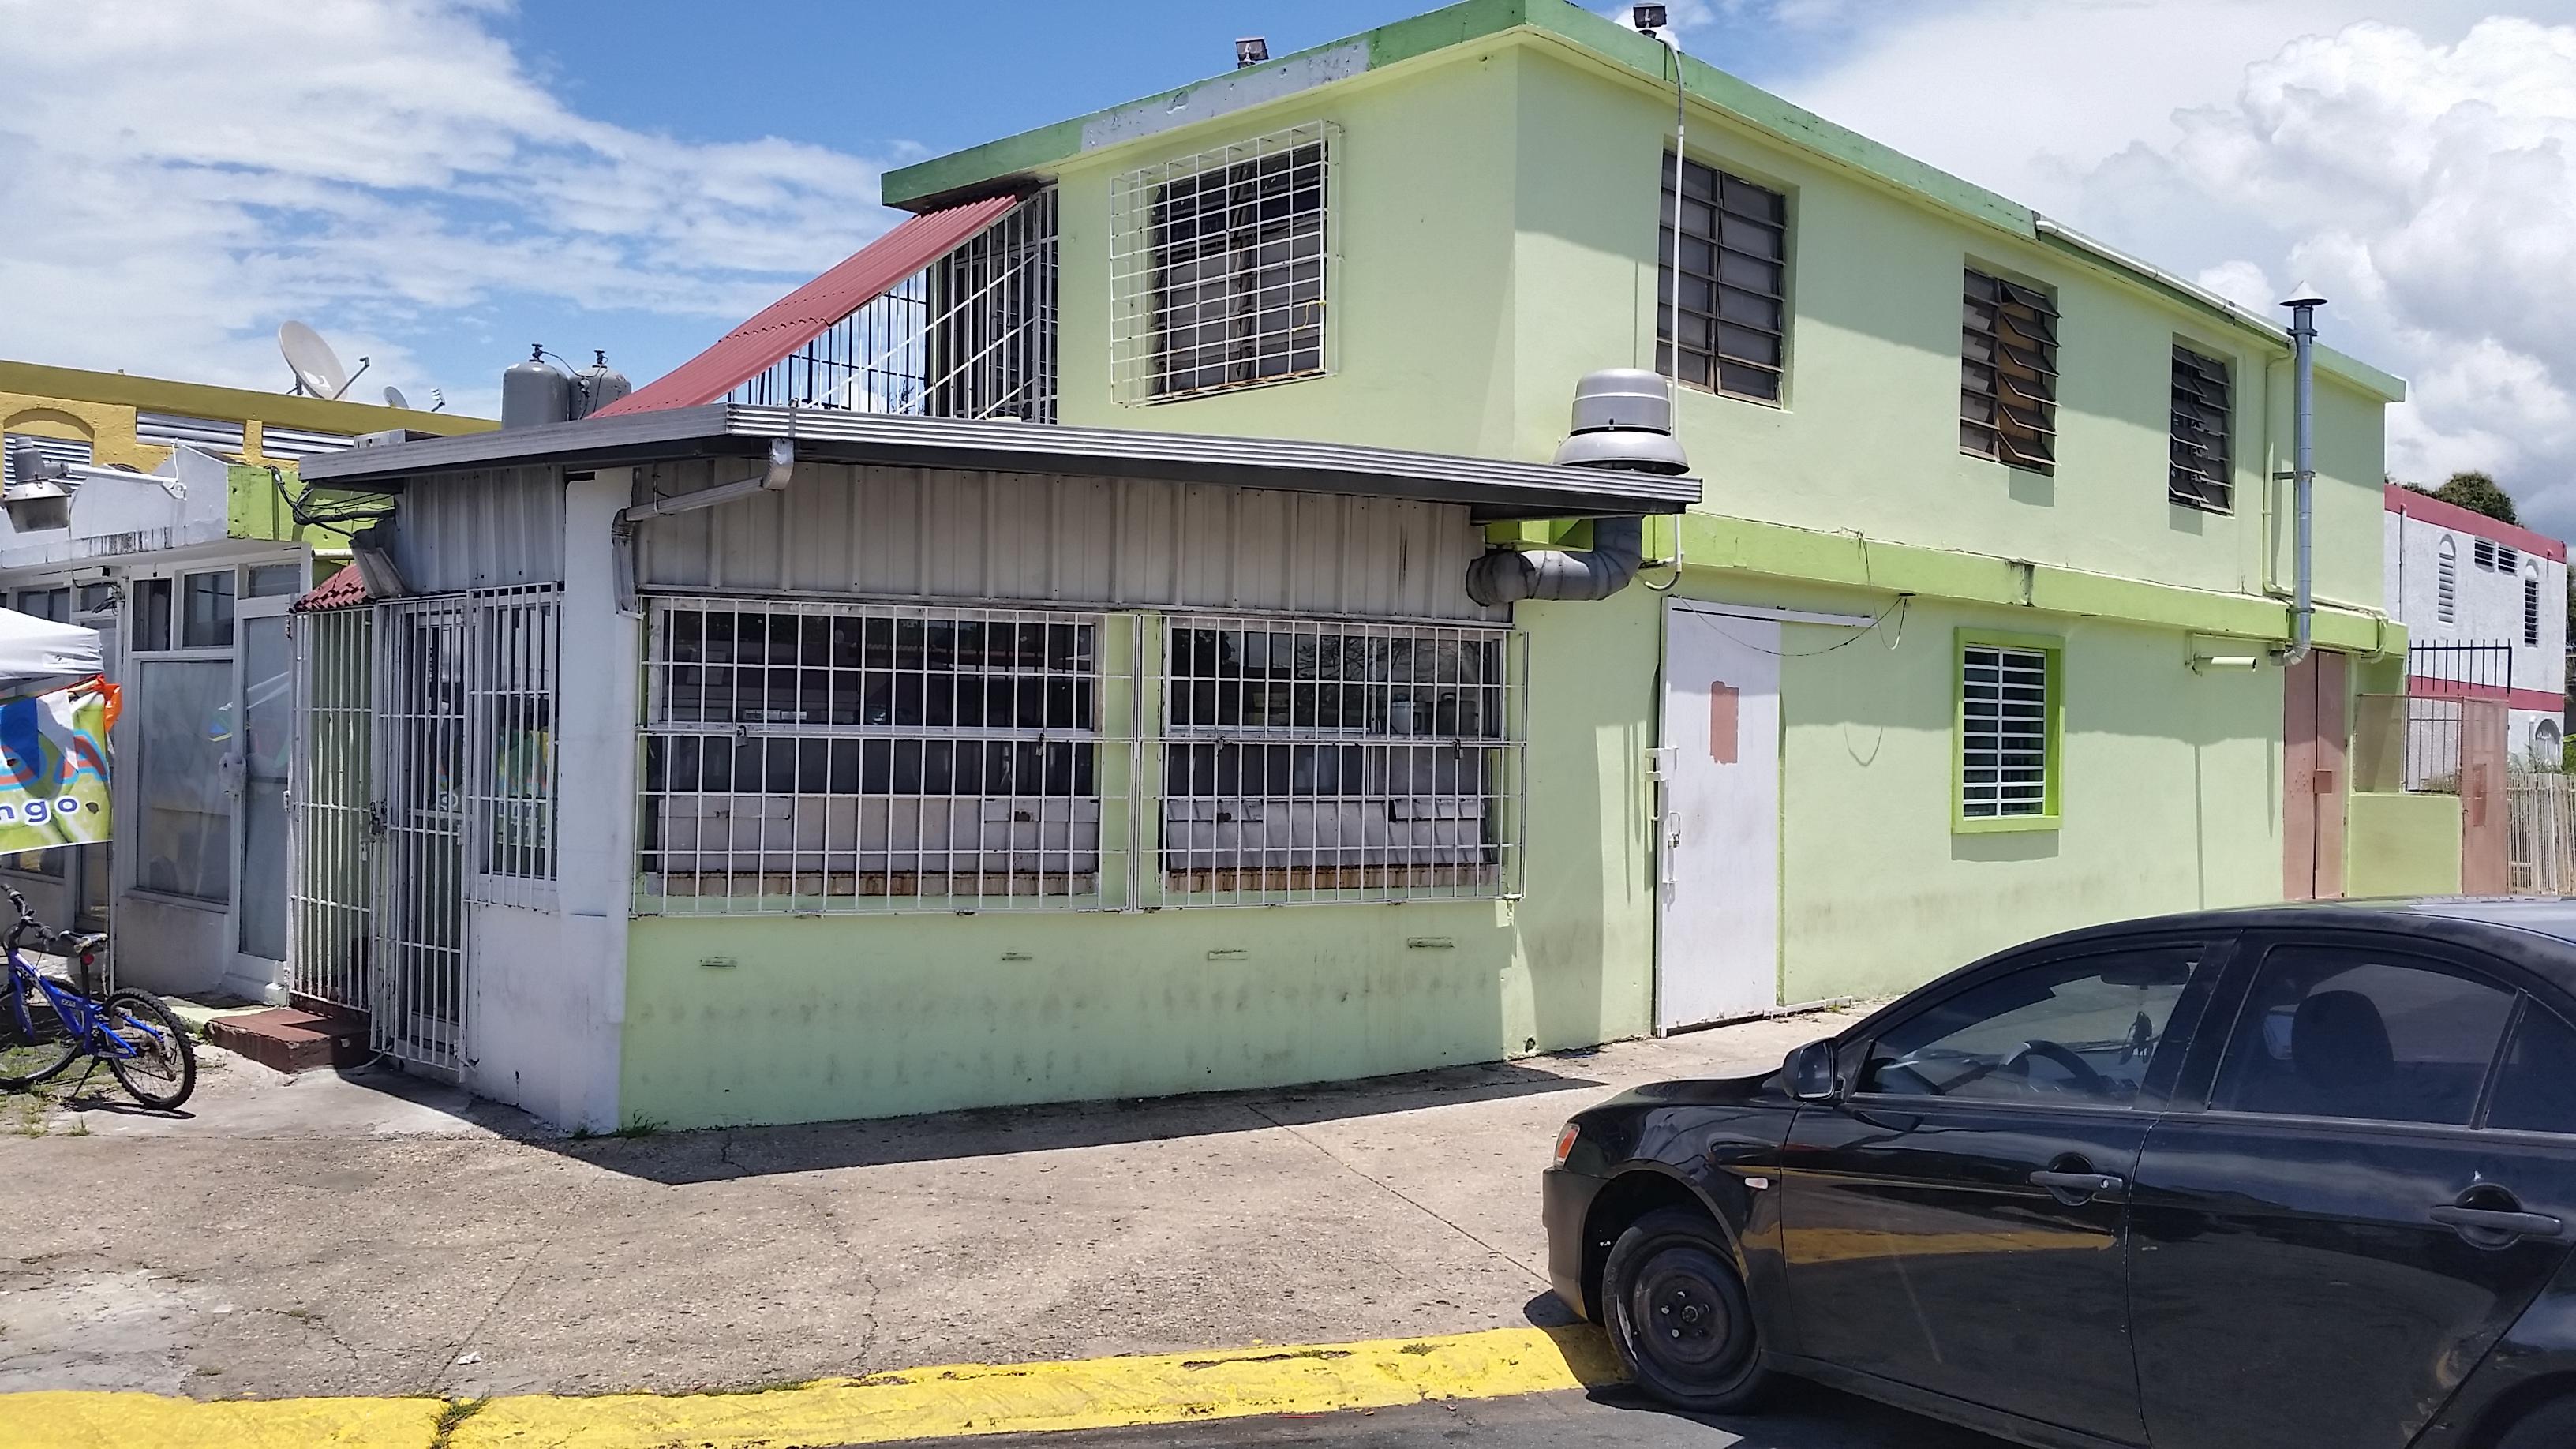 US Treasury Multi-Use Building In Toa Baja, PR (Calle Amalia Paoli) Online Auction